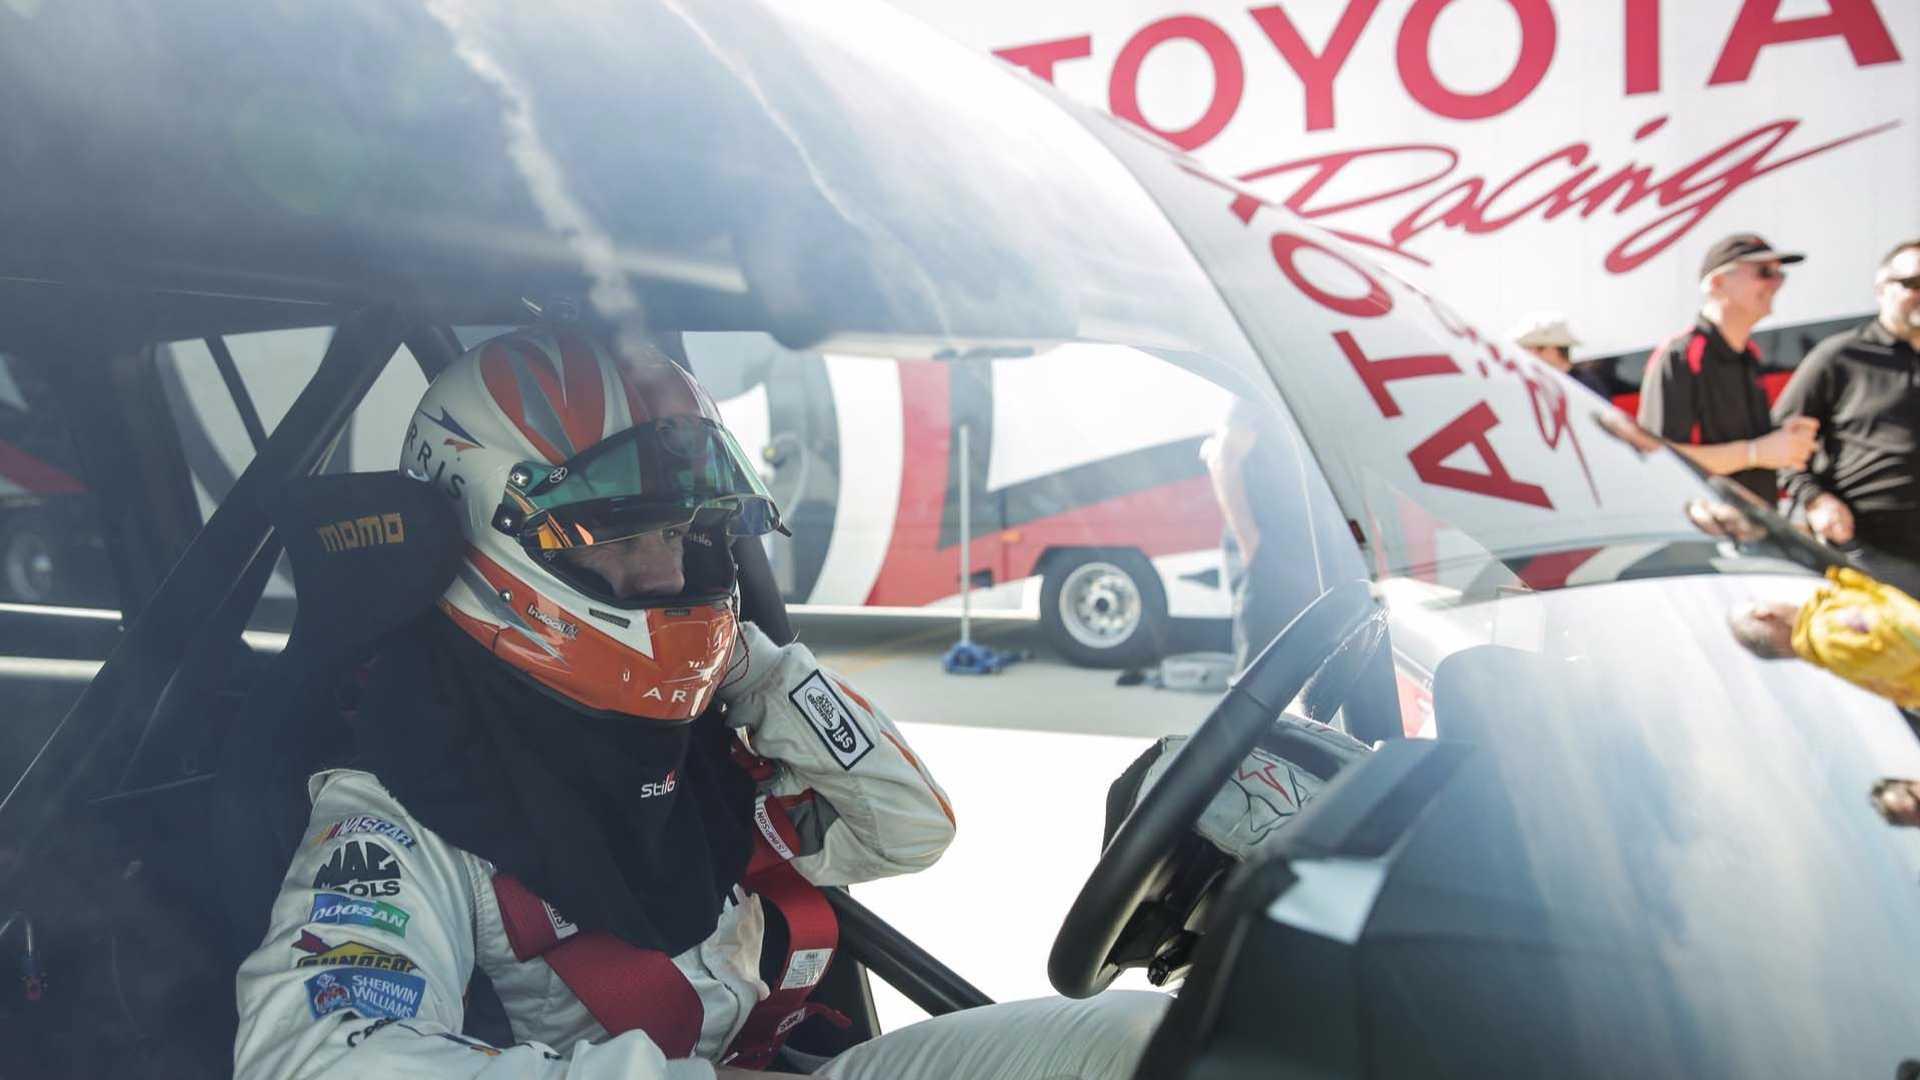 Toyota_Land_Cruiser_Speed_Record_03